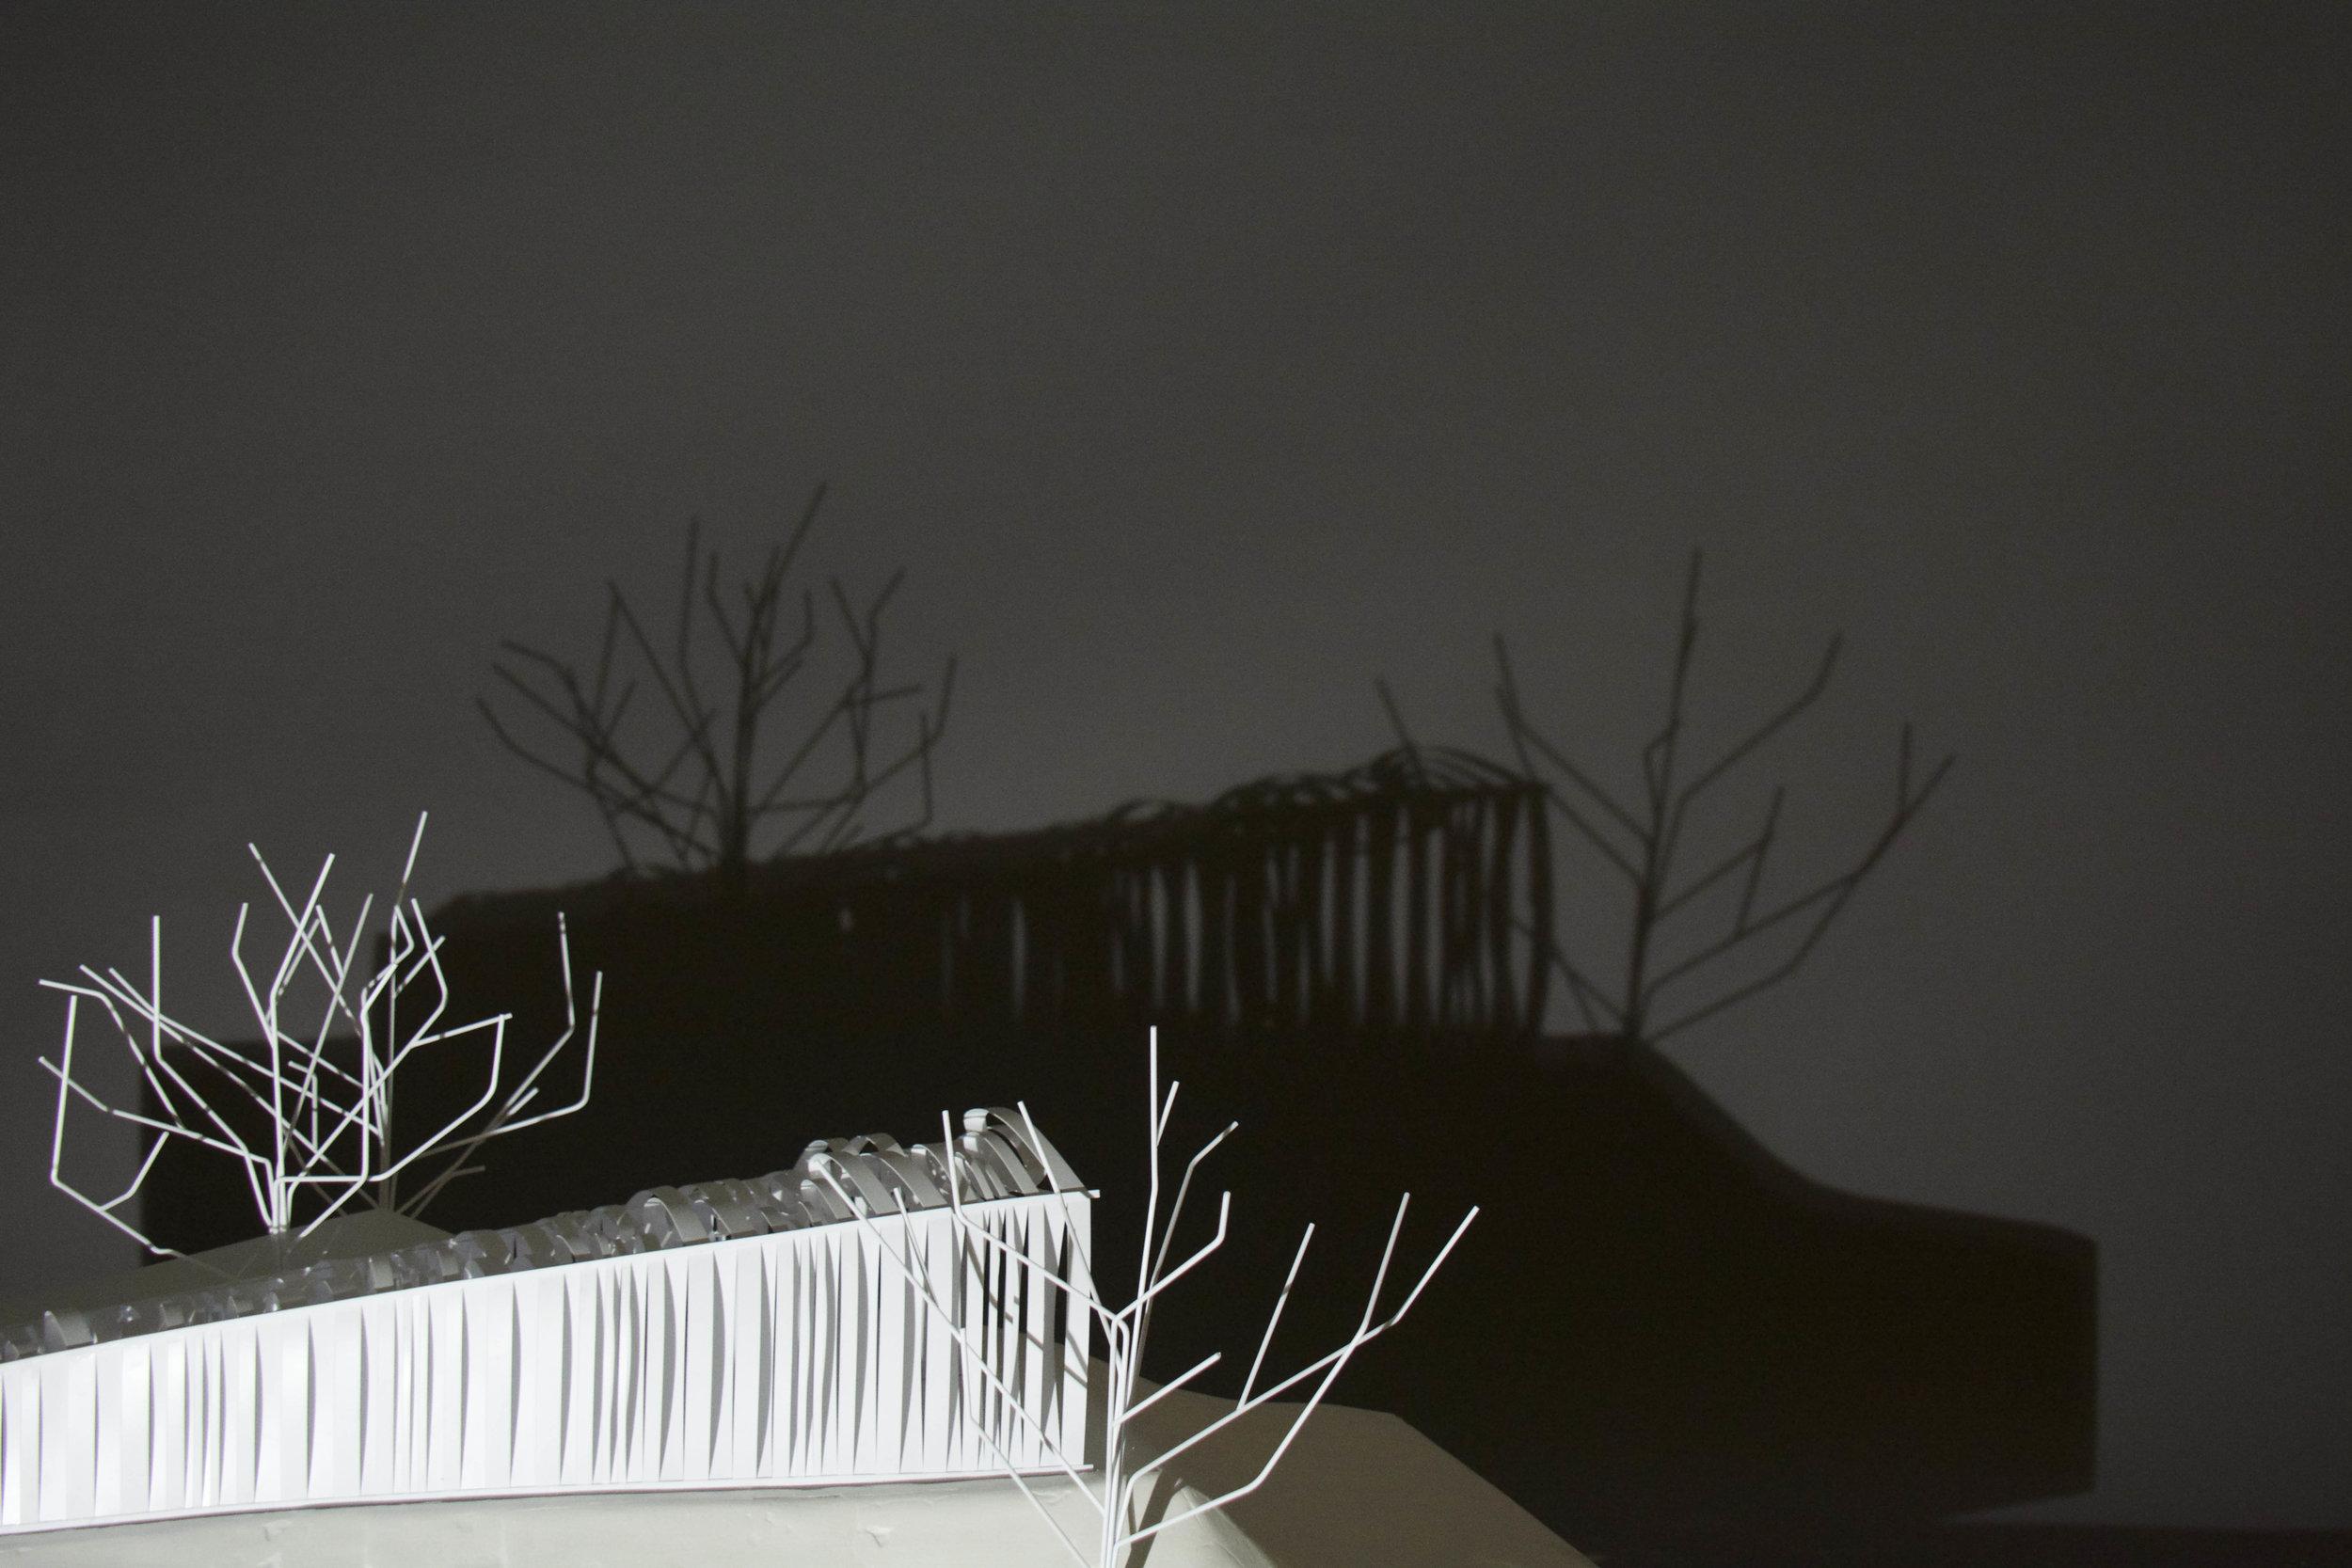 Chapel House - WashU Core III Studio - Non-denominational Chapel - Clayton, MOexperiencing space + light2014